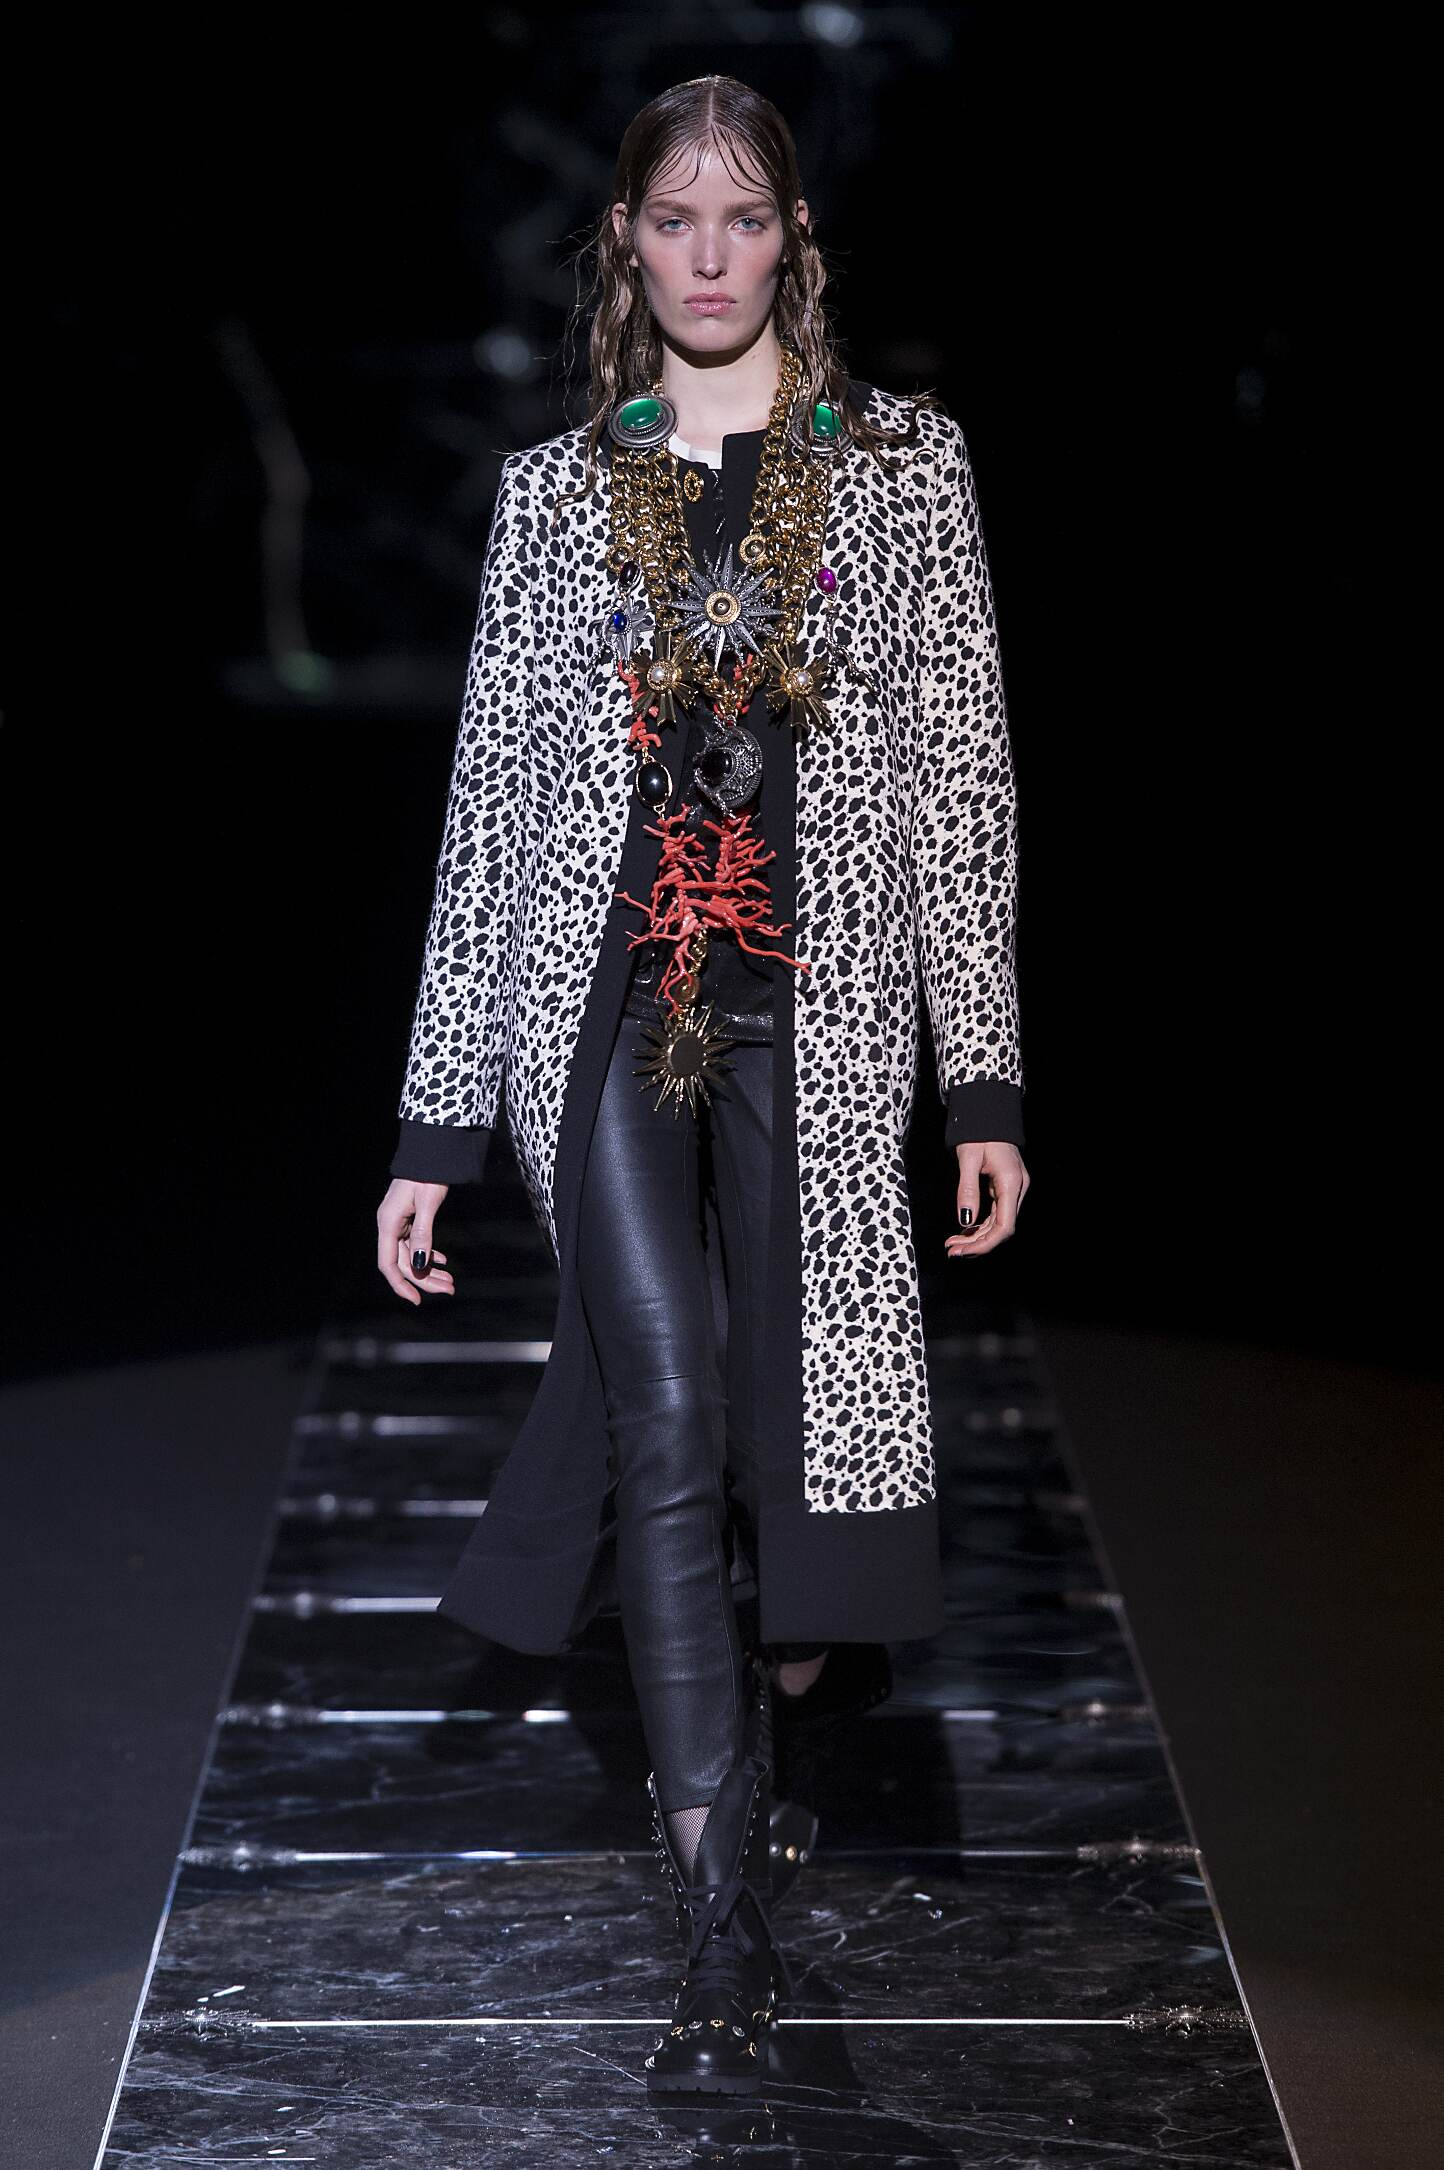 Runway Fausto Puglisi Fall Winter 2015 16 Women's Collection Milan Fashion Week